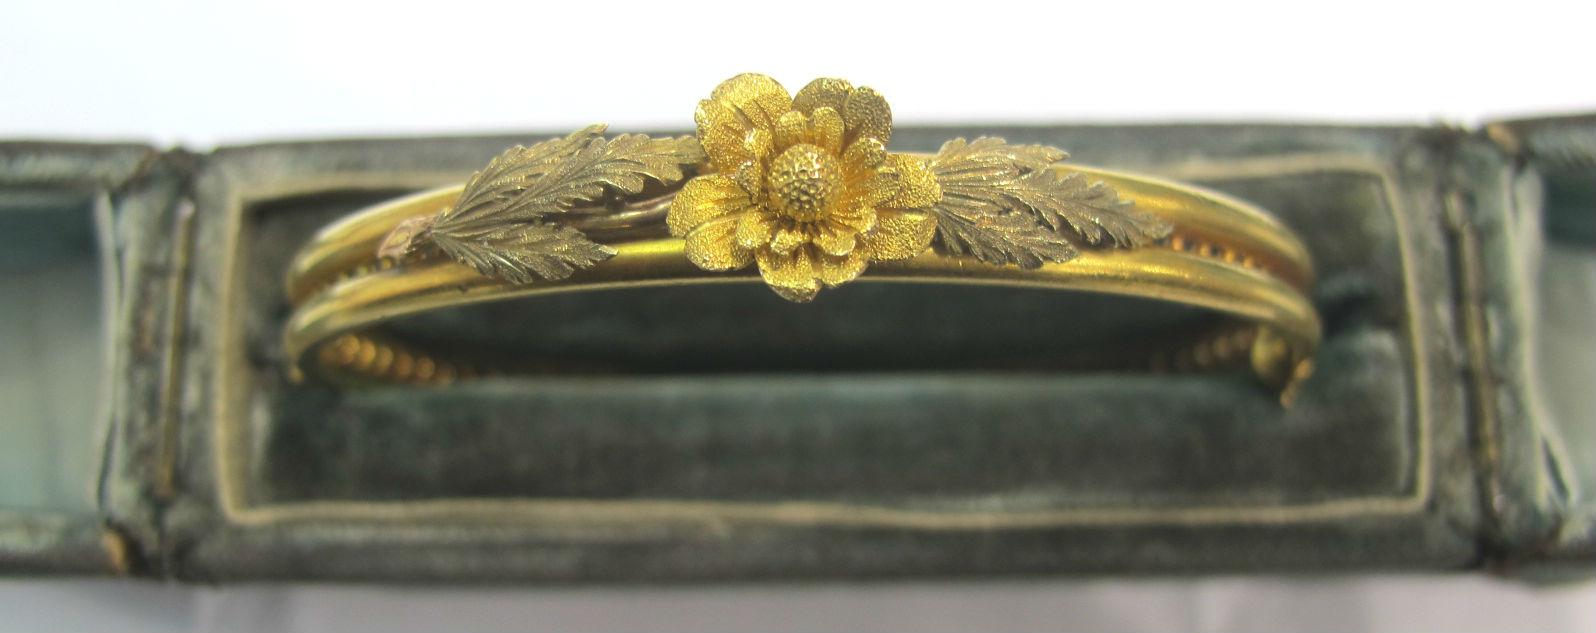 Victorian 18k yellow gold bangle bracelet, available at Gray & Davis.